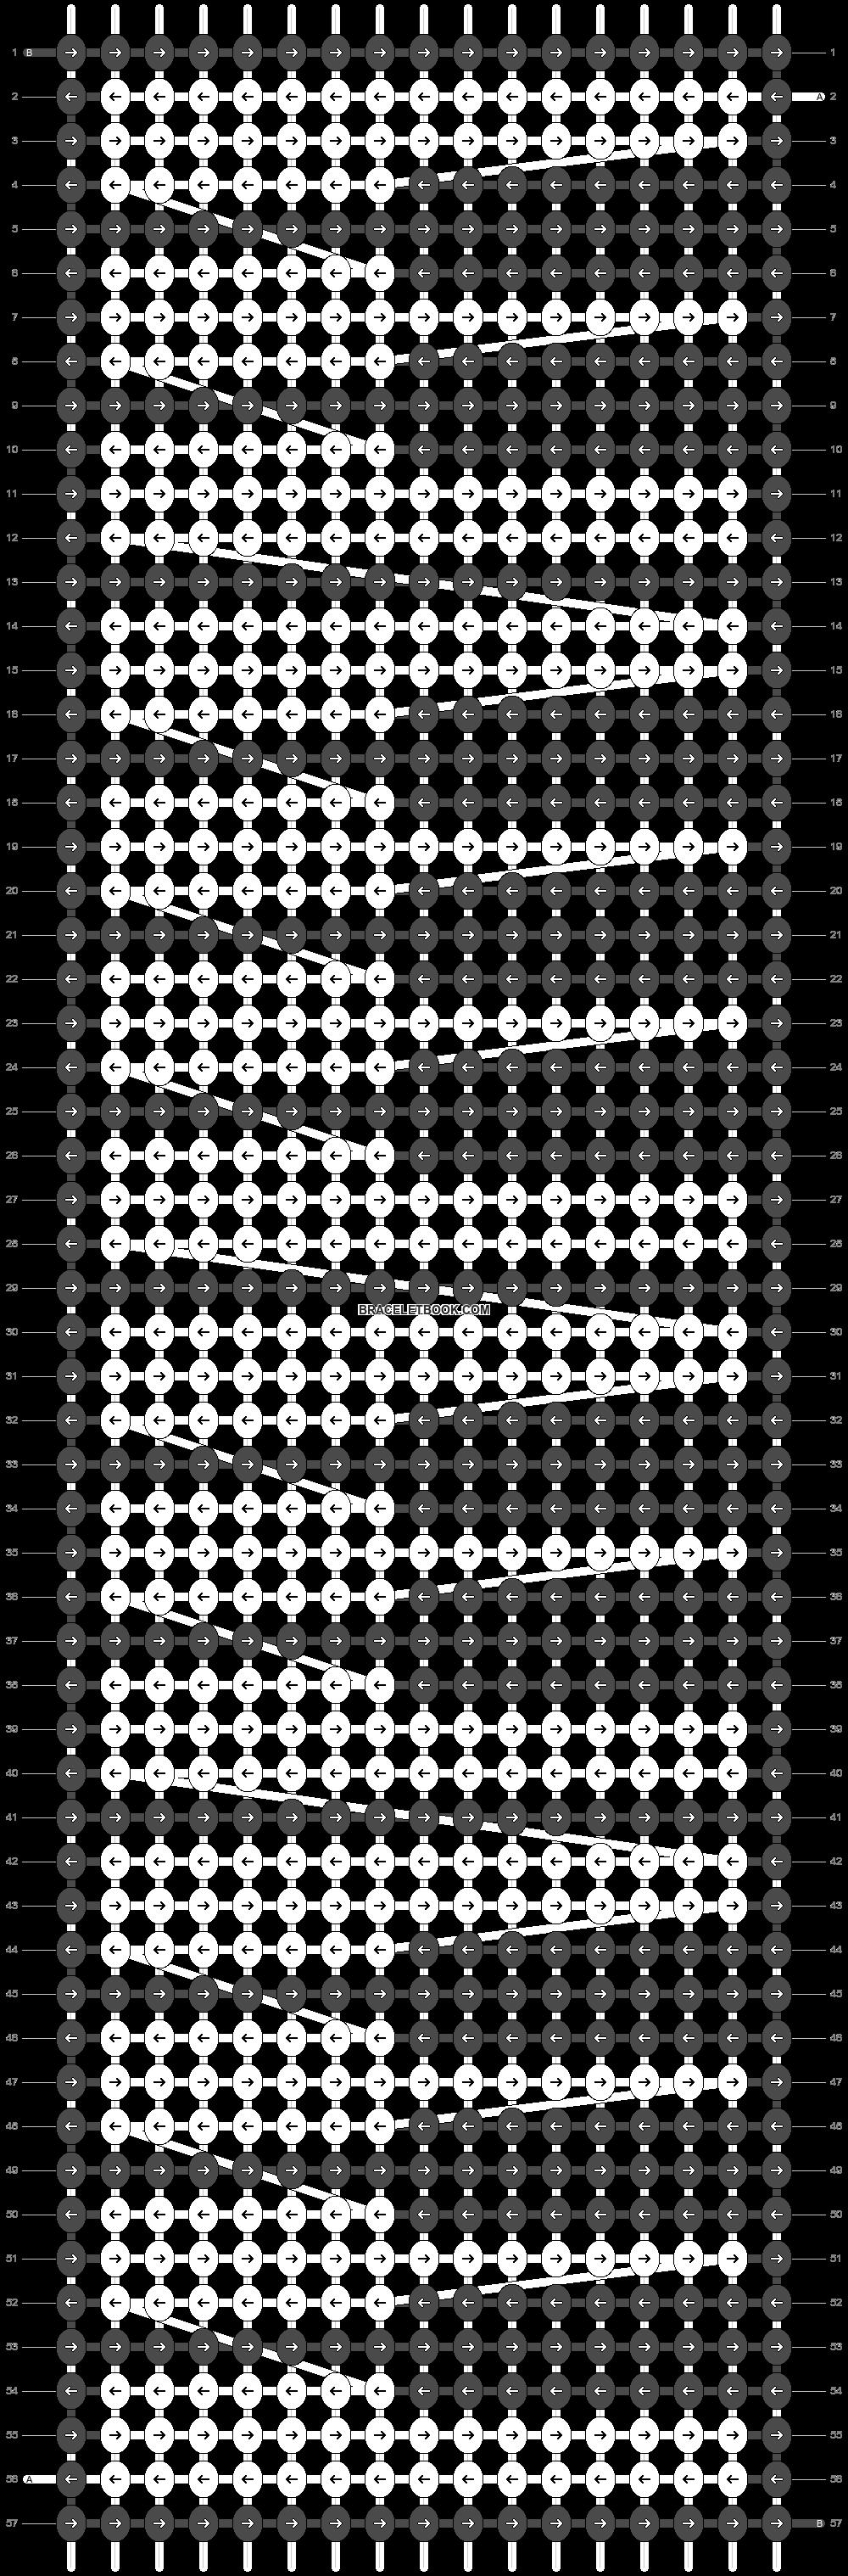 Alpha pattern #46040 pattern